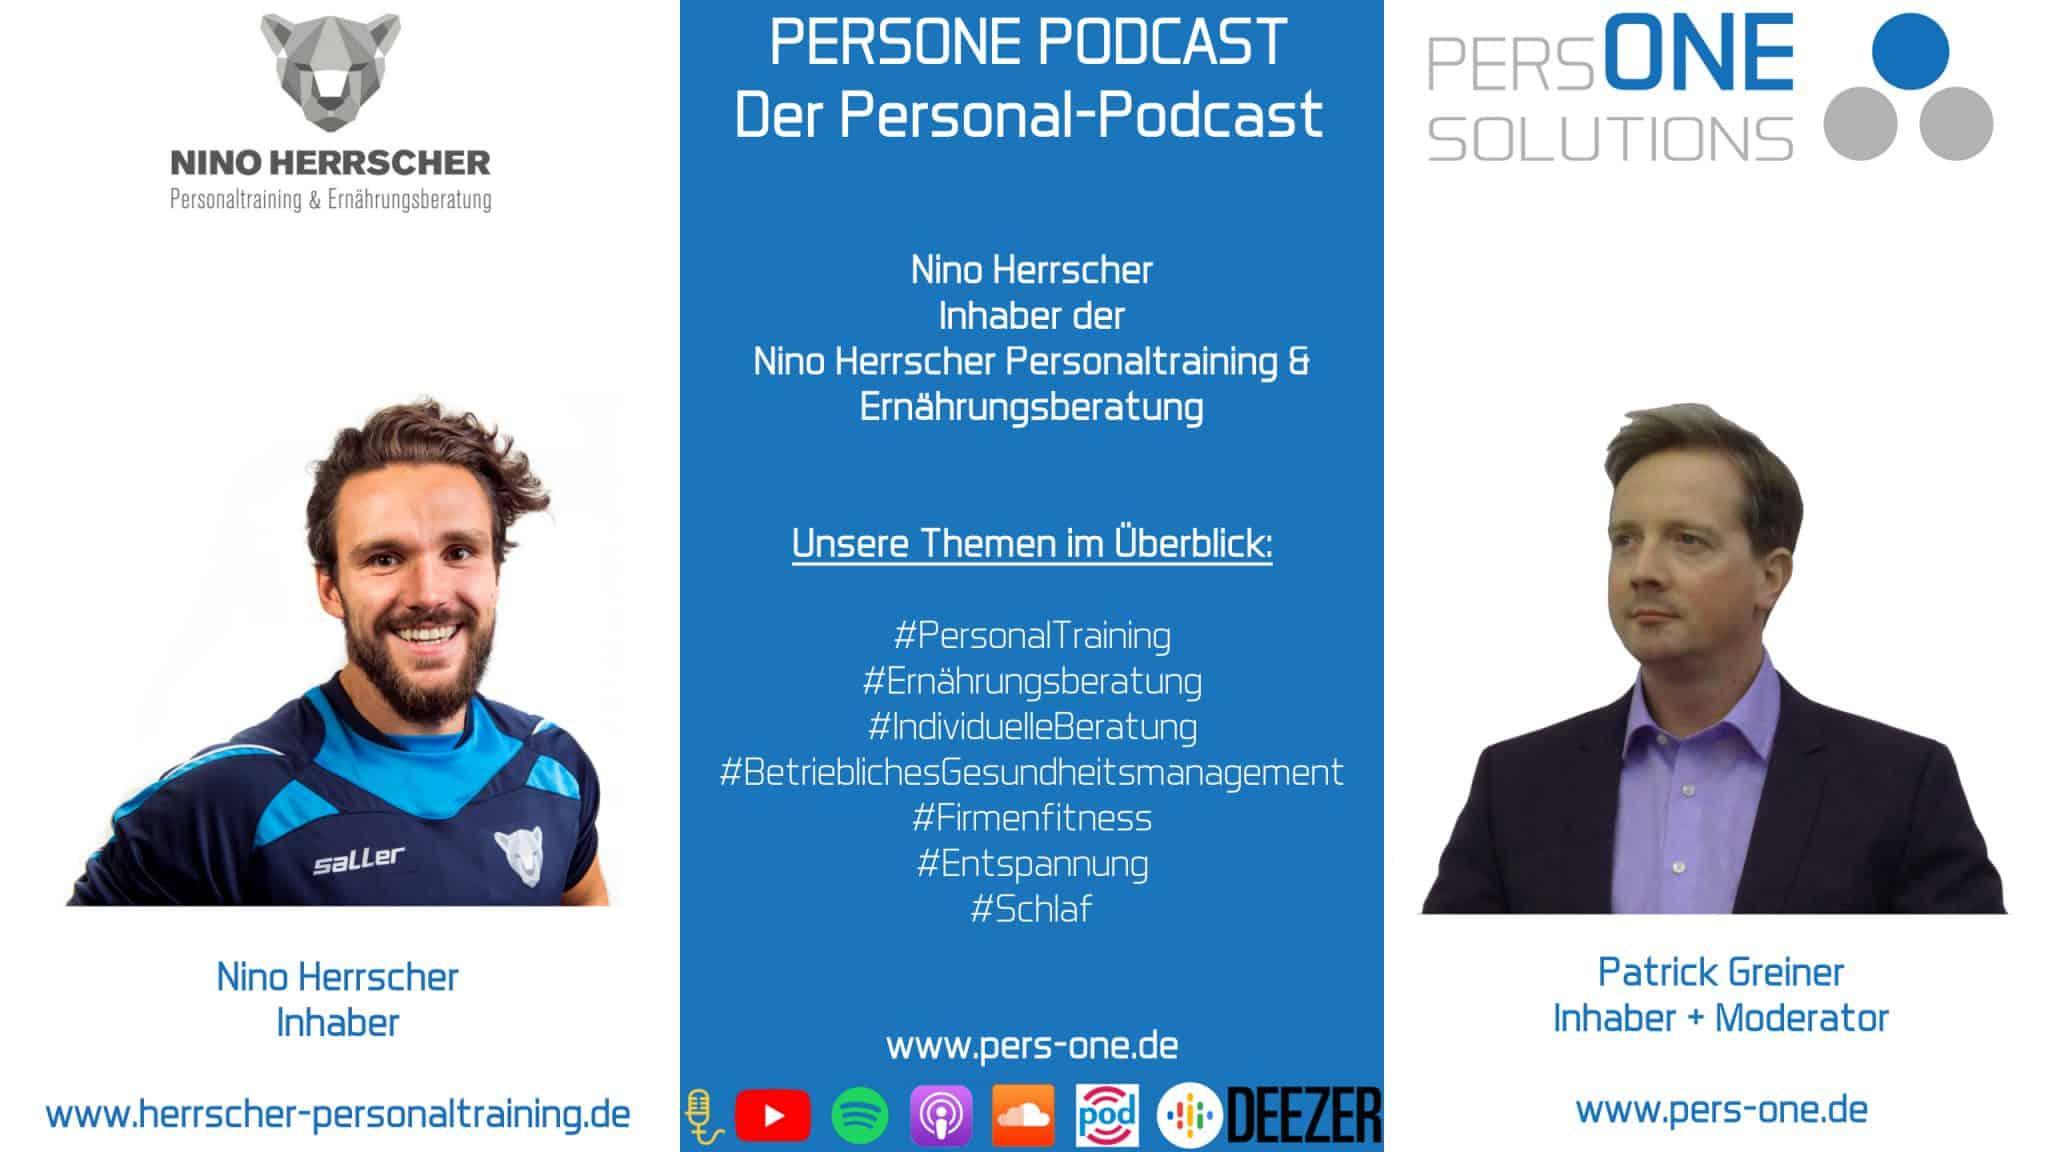 Nino Herrscher_Personaltraining_PERSONE PODCAST